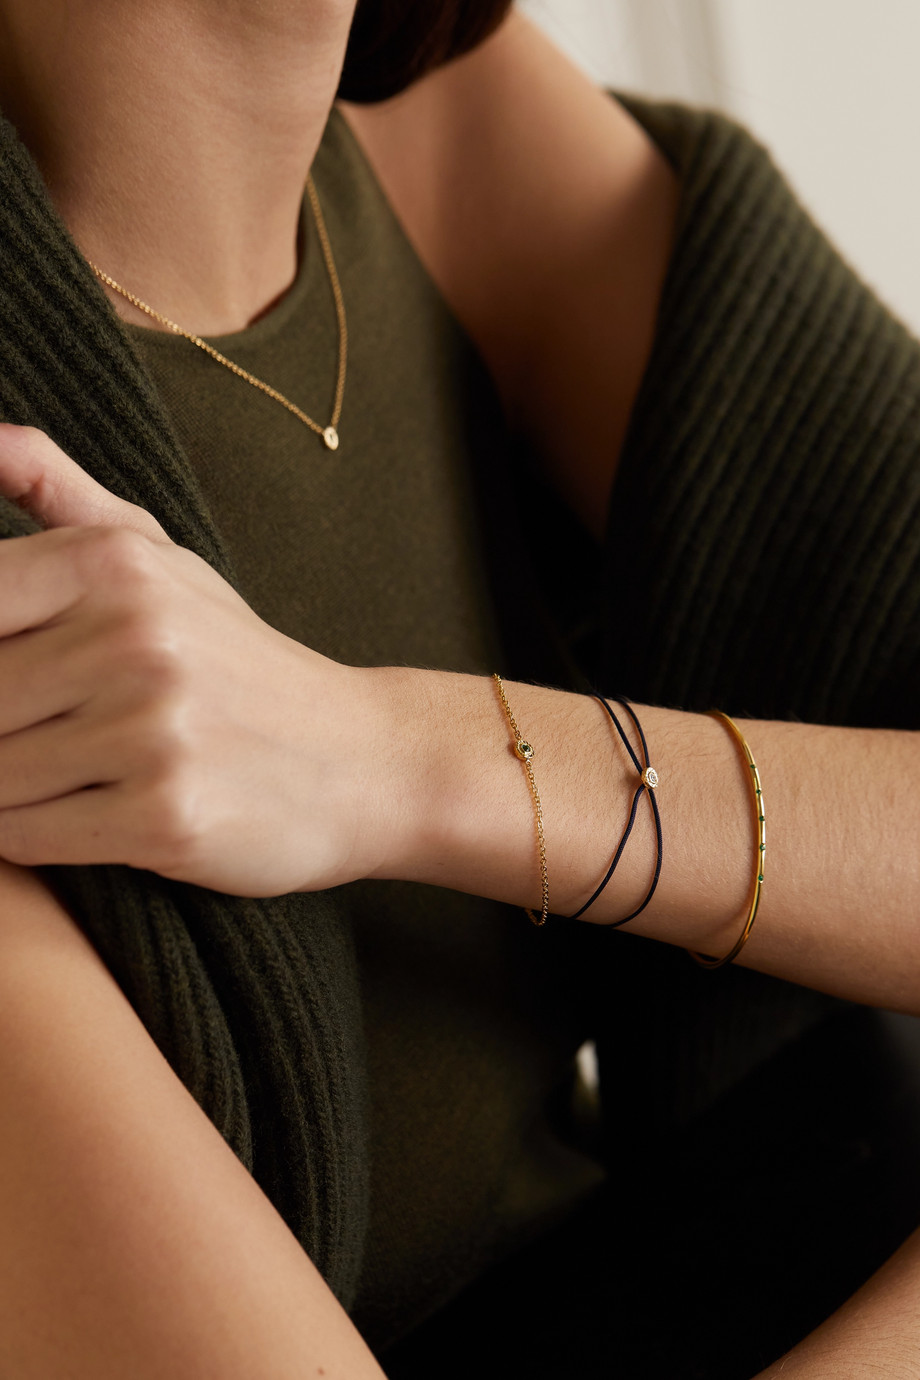 Octavia Elizabeth + NET SUSTAIN Nesting Gem Armband aus recyceltem 18 Karat Gold mit Smaragd